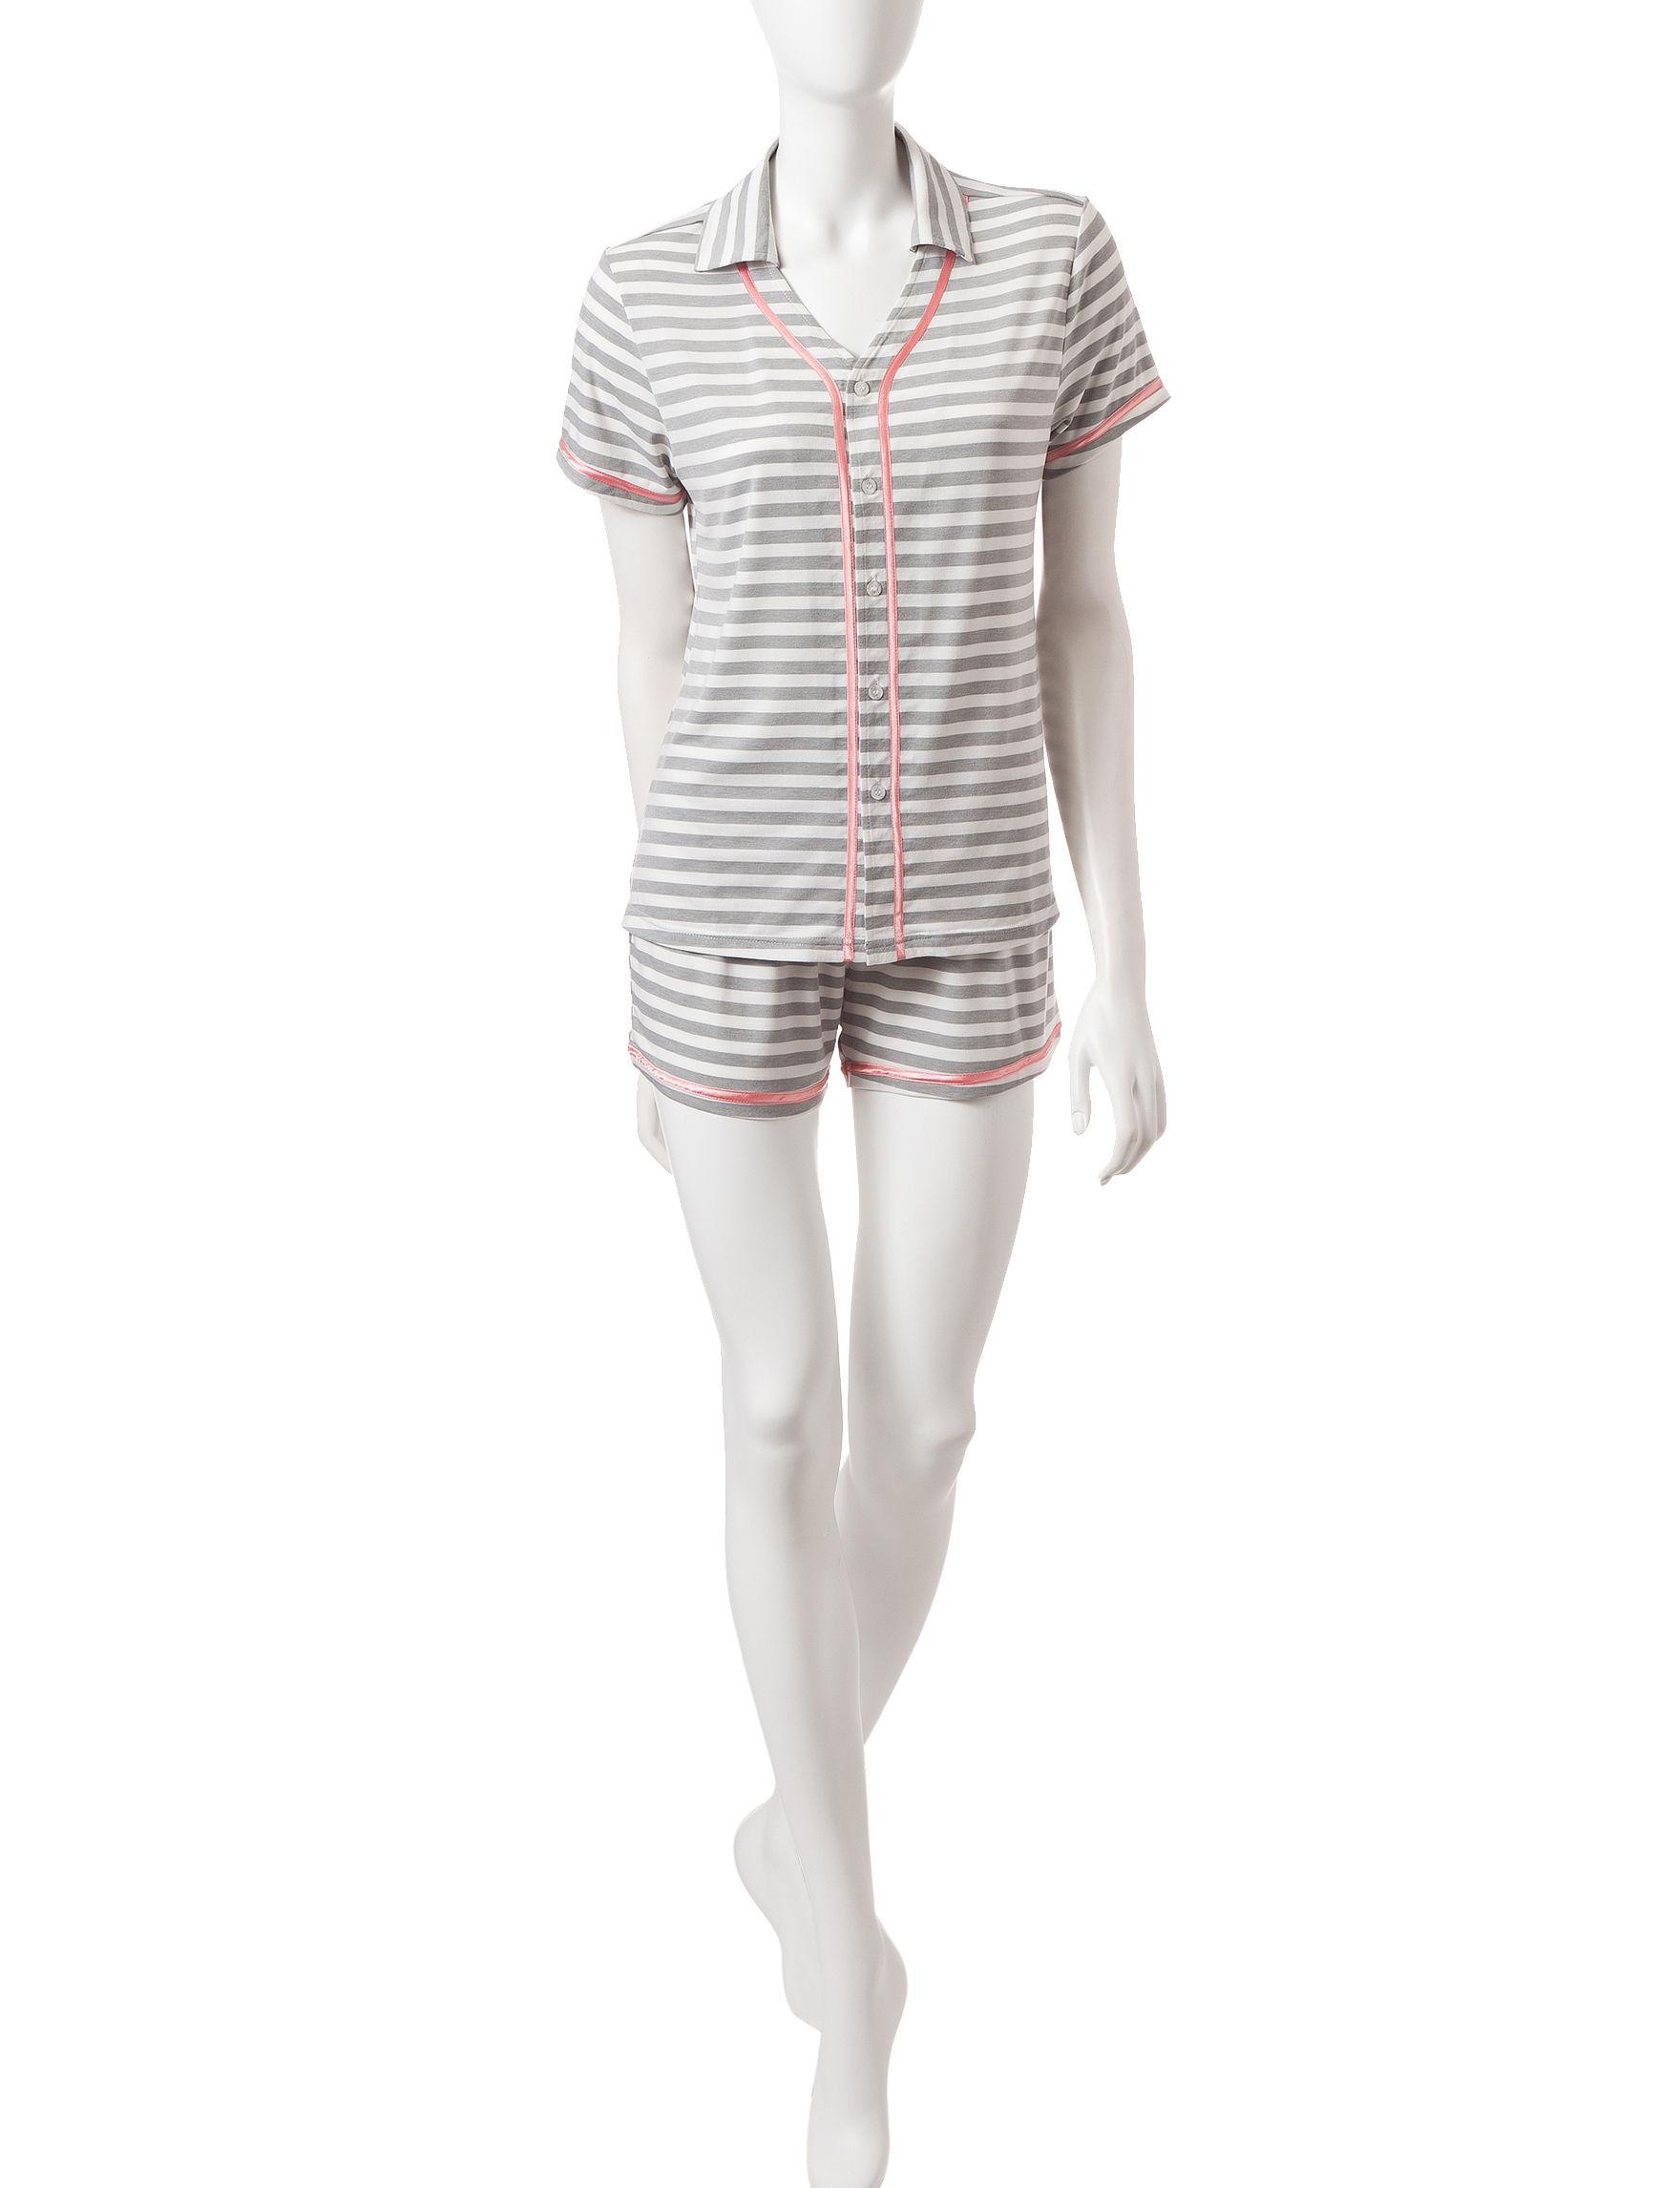 Hanes Grey / White Pajama Sets